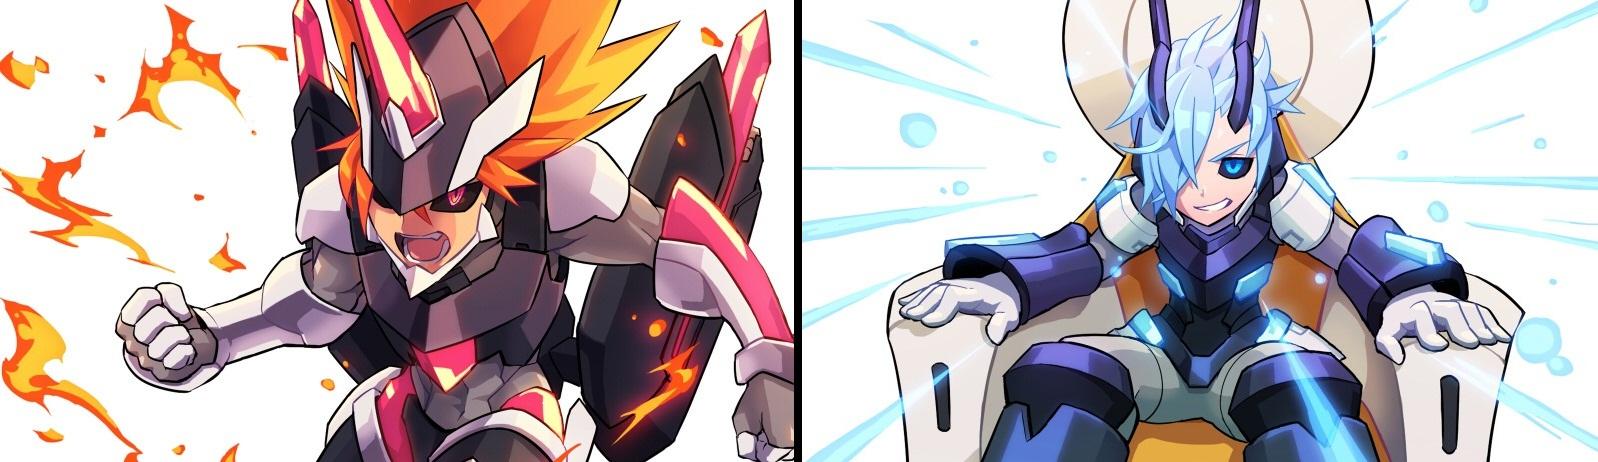 Azure-Striker-Gunvolt-Character-Art-Daytona-Malec-01